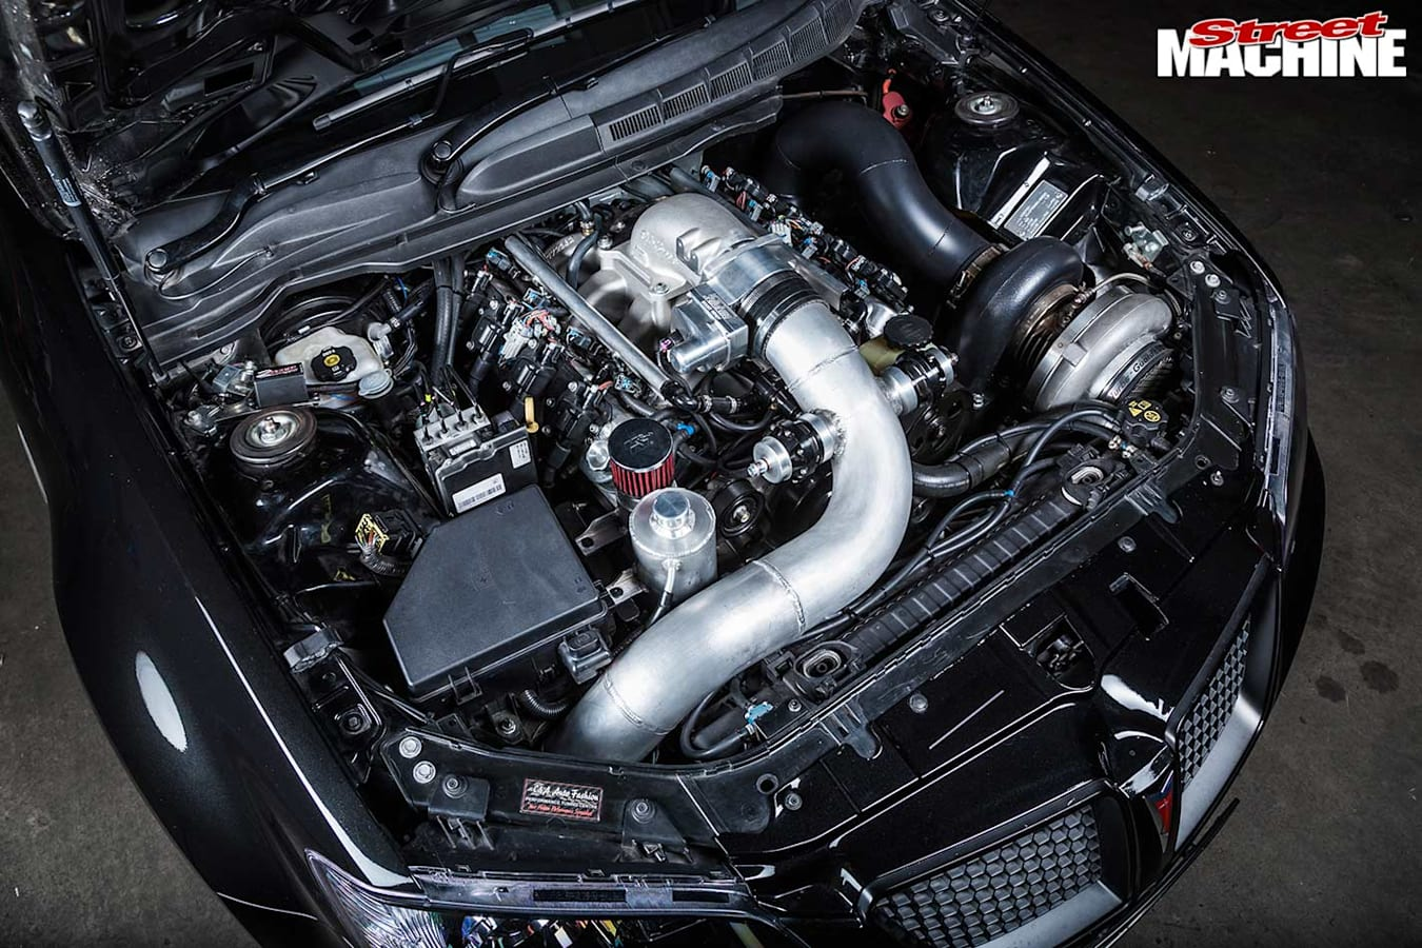 Holden Commodore engine bay